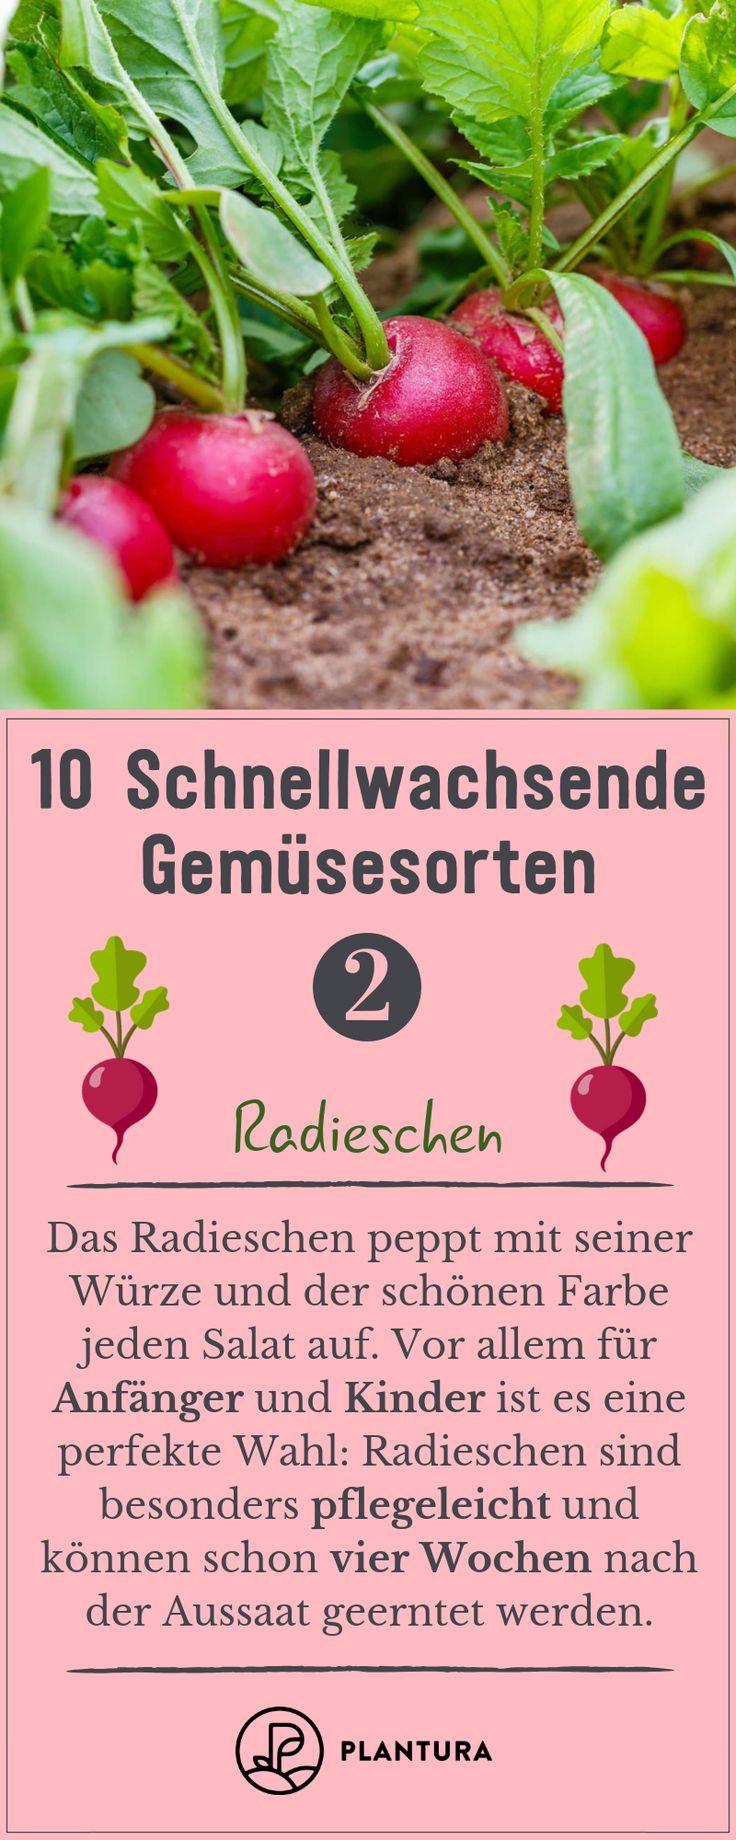 10 schnellwachsende Gemüsesorten – Plantura | Garten Ideen & Tipps | Gemüse, Obst, Kräuter